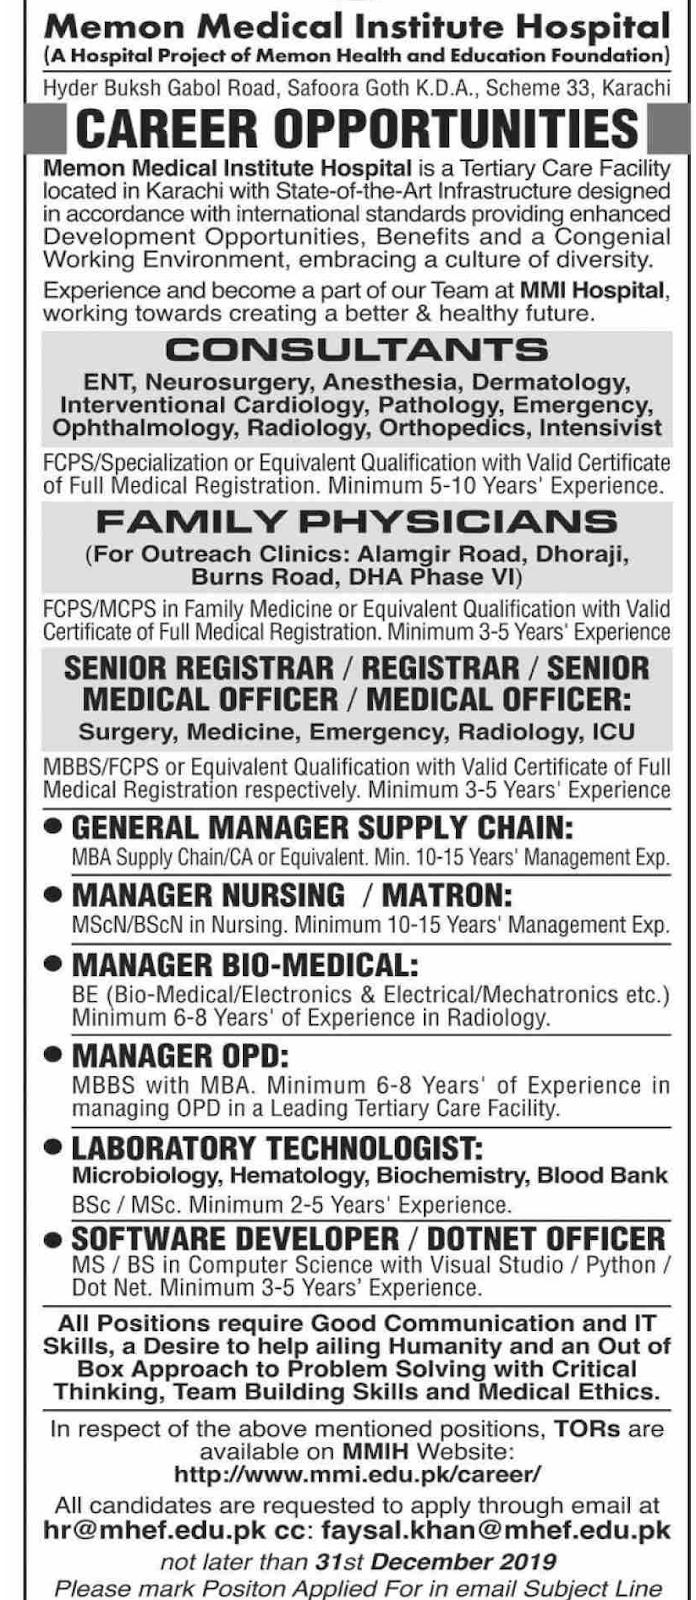 Jobs in Memon Medical Institute Hospital 2019